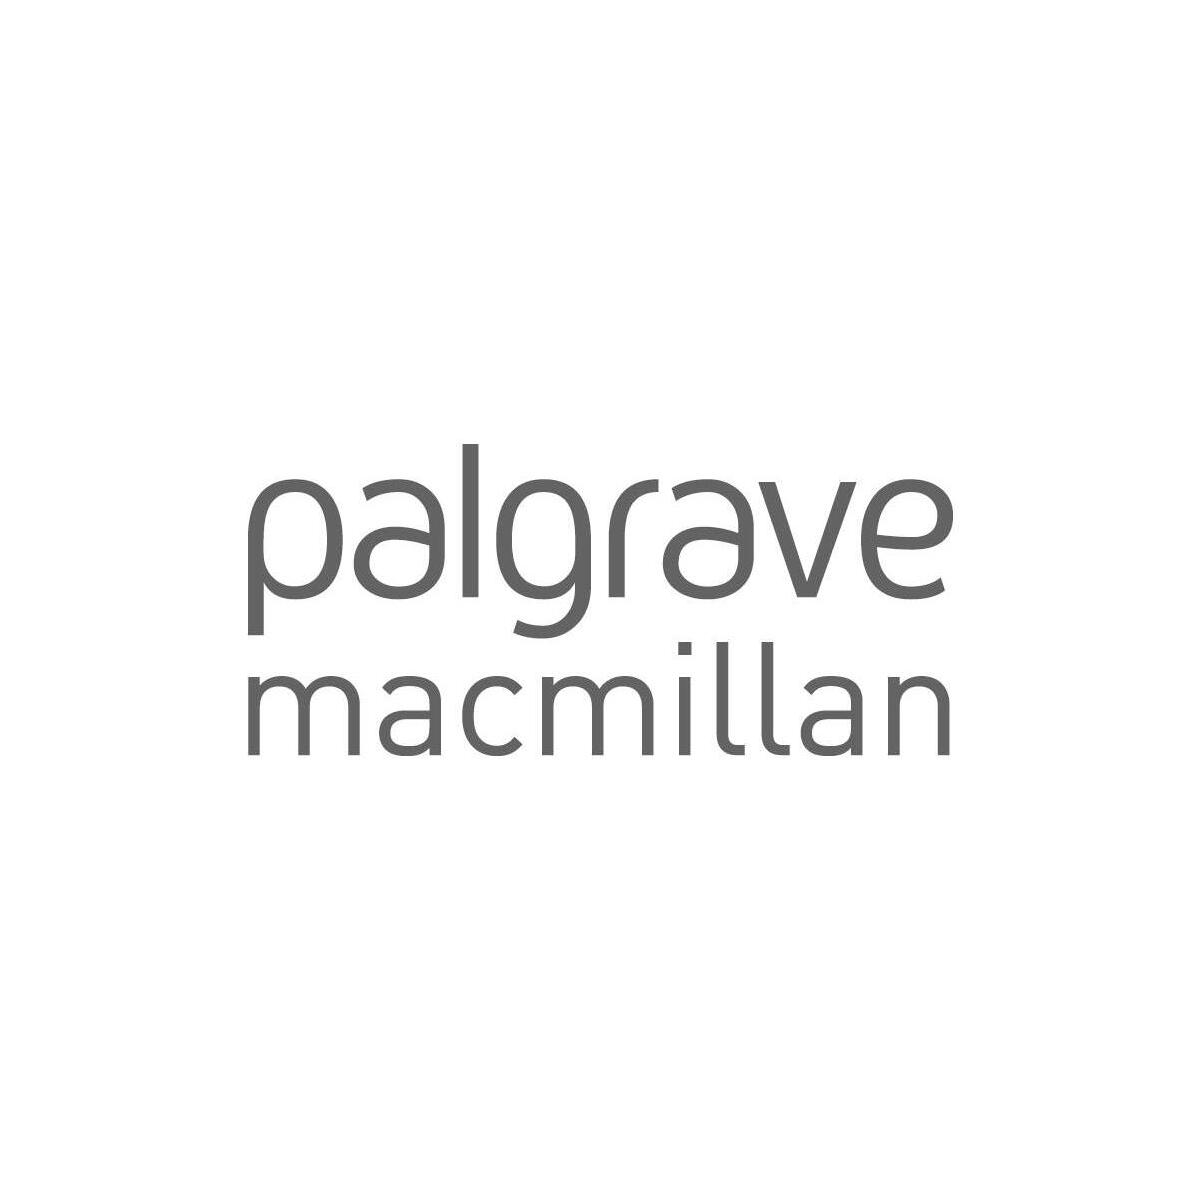 Palgrave